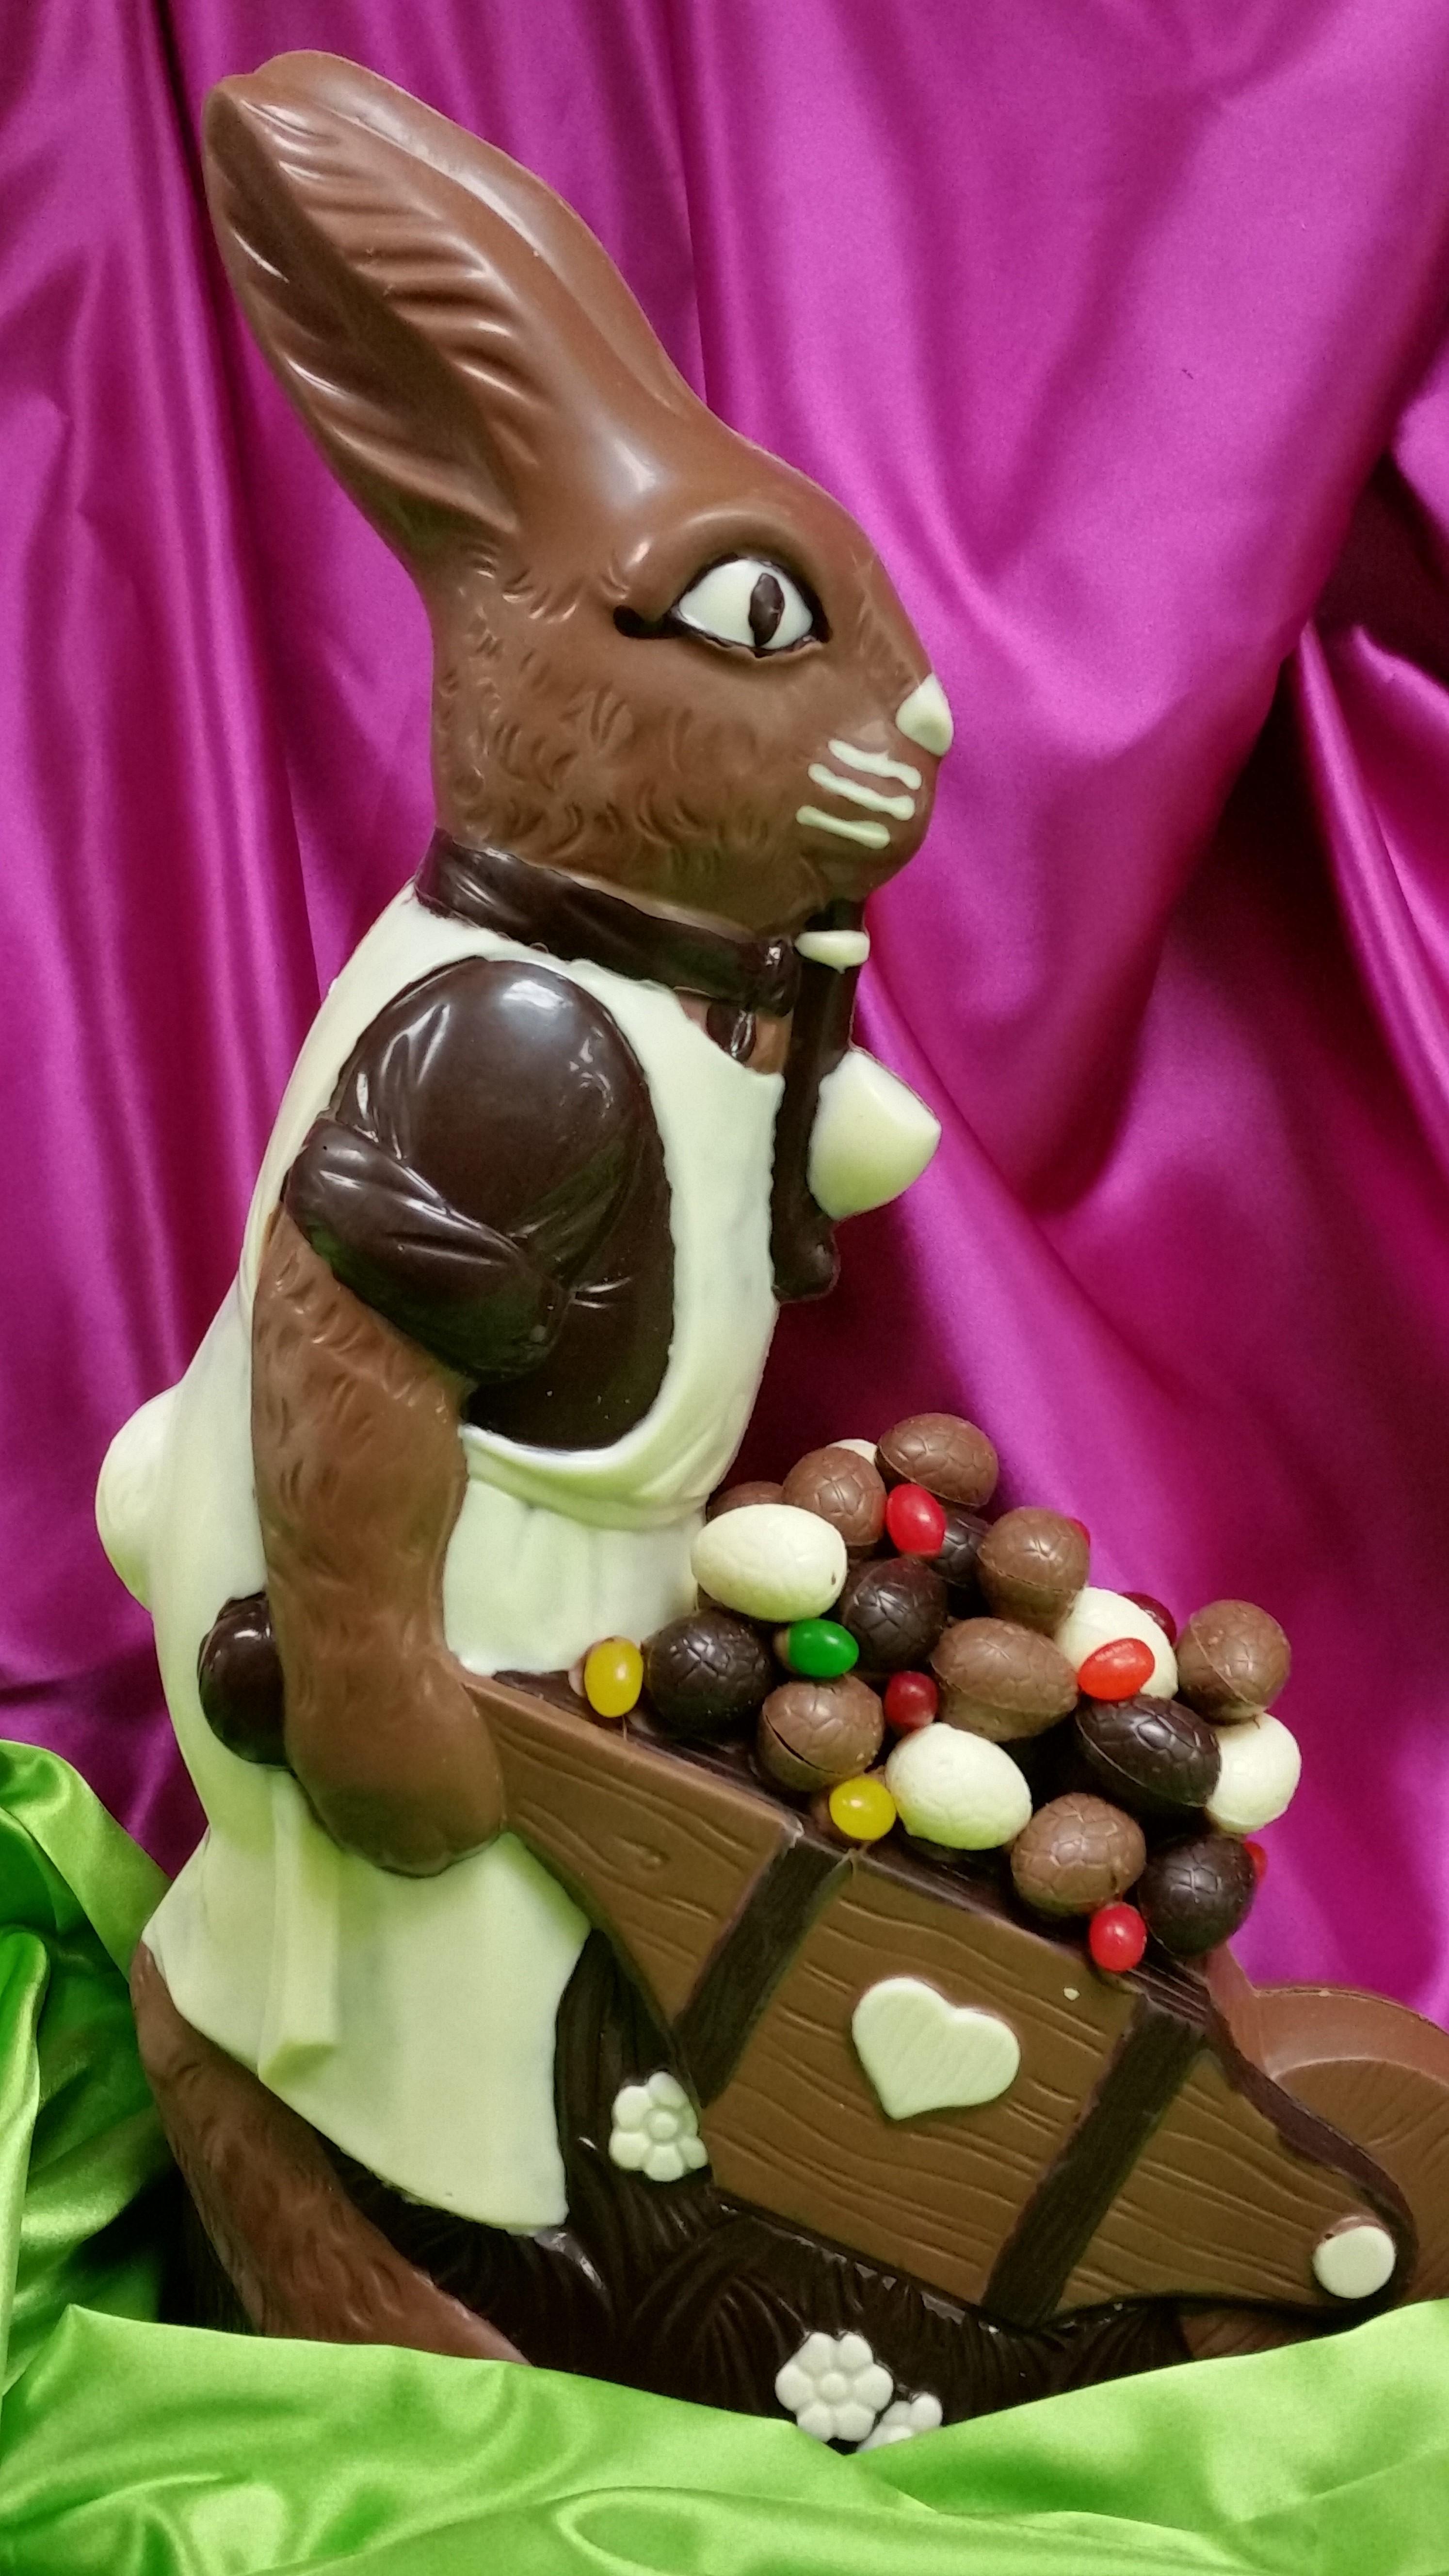 Bobbie Bunny